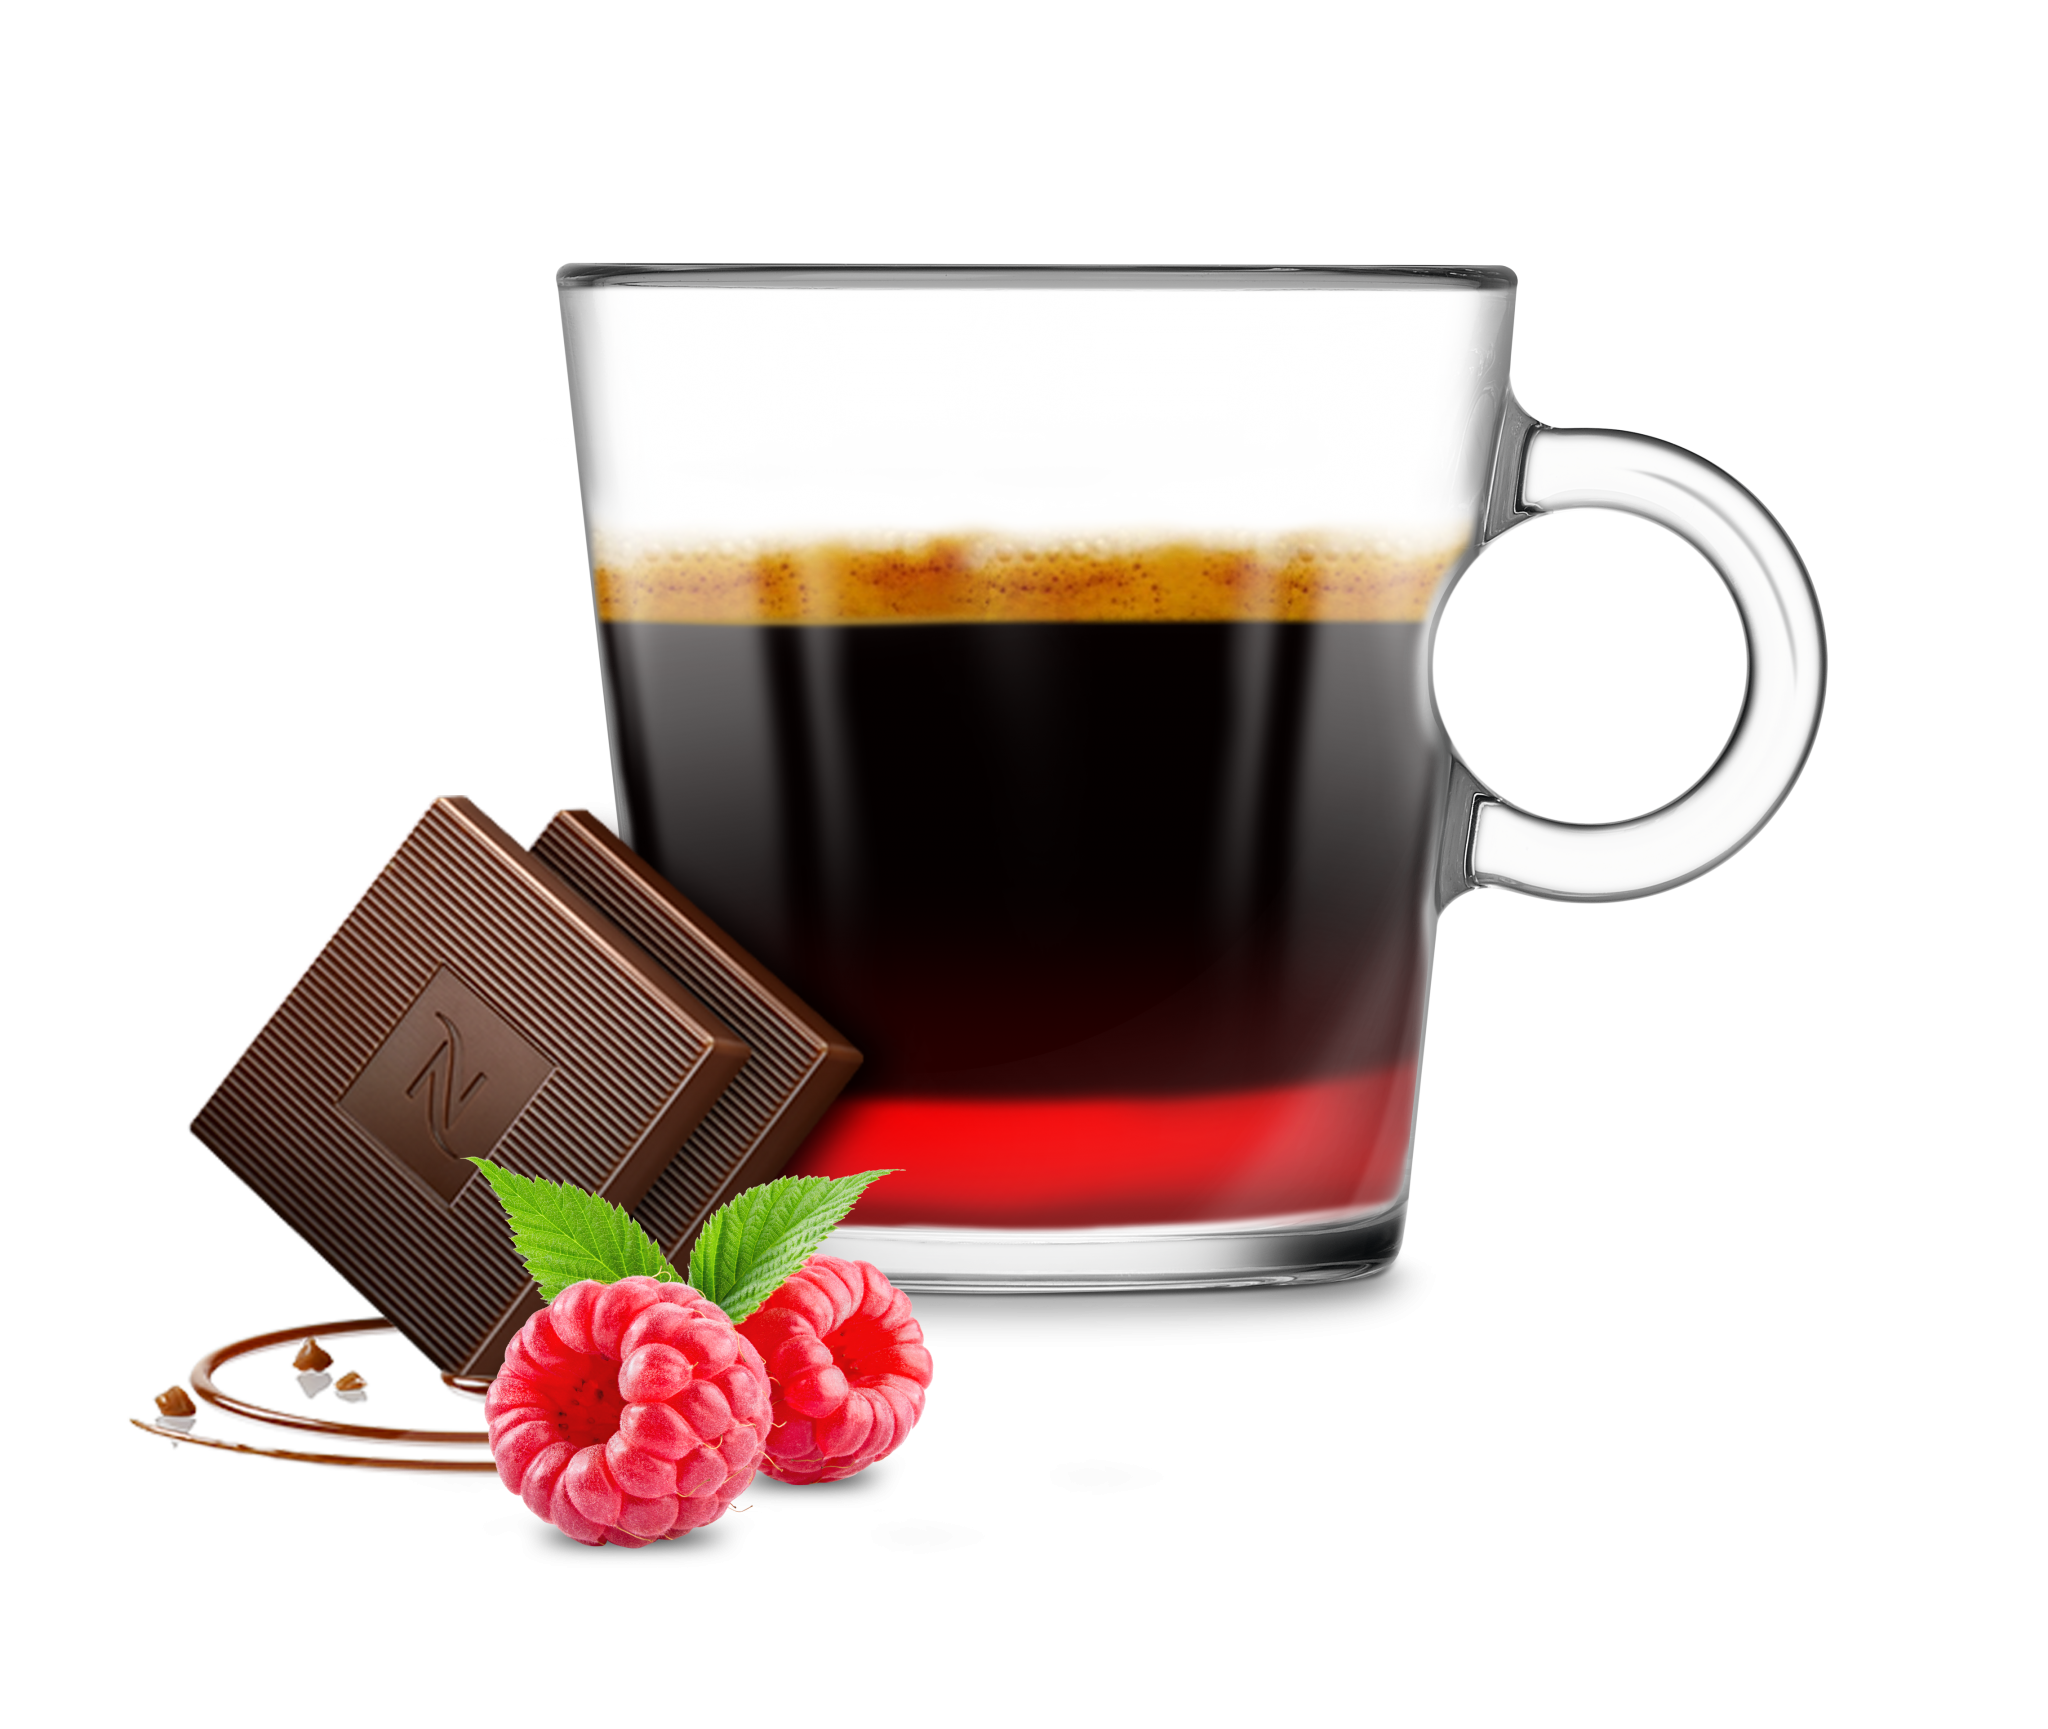 idealna poranna kawa wprracy